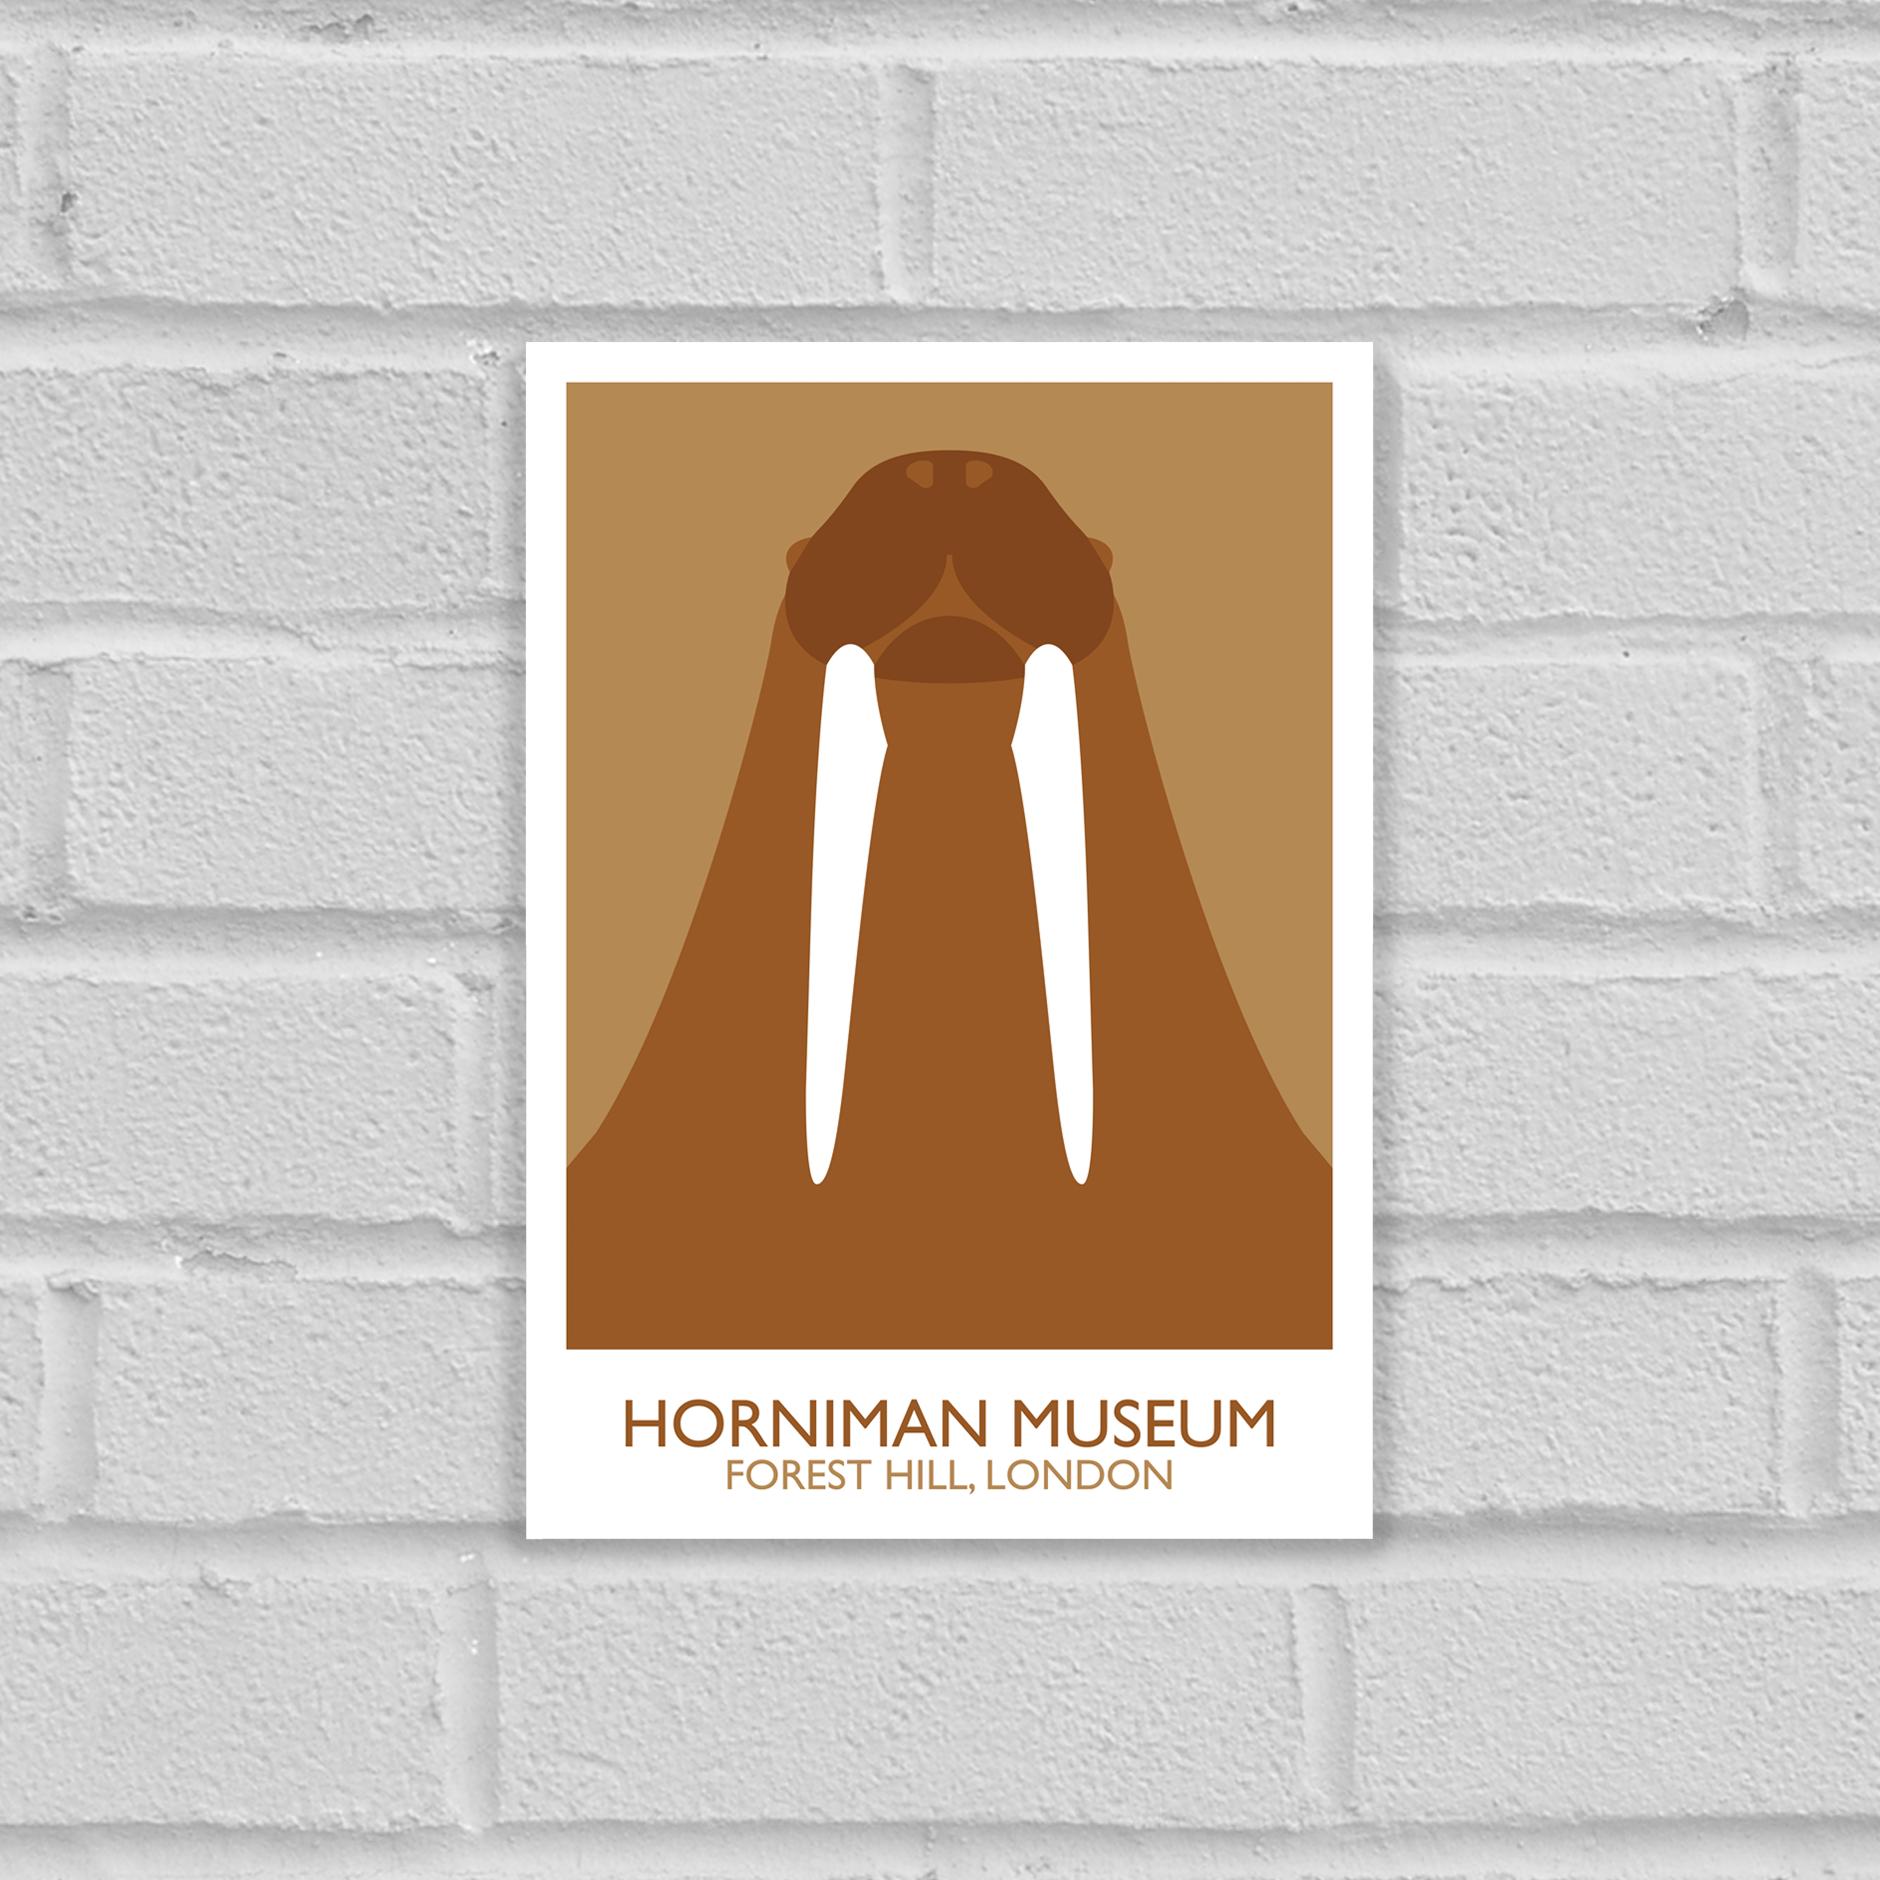 Horniman Museum Walrus Landmark Art Poster Print Unframed